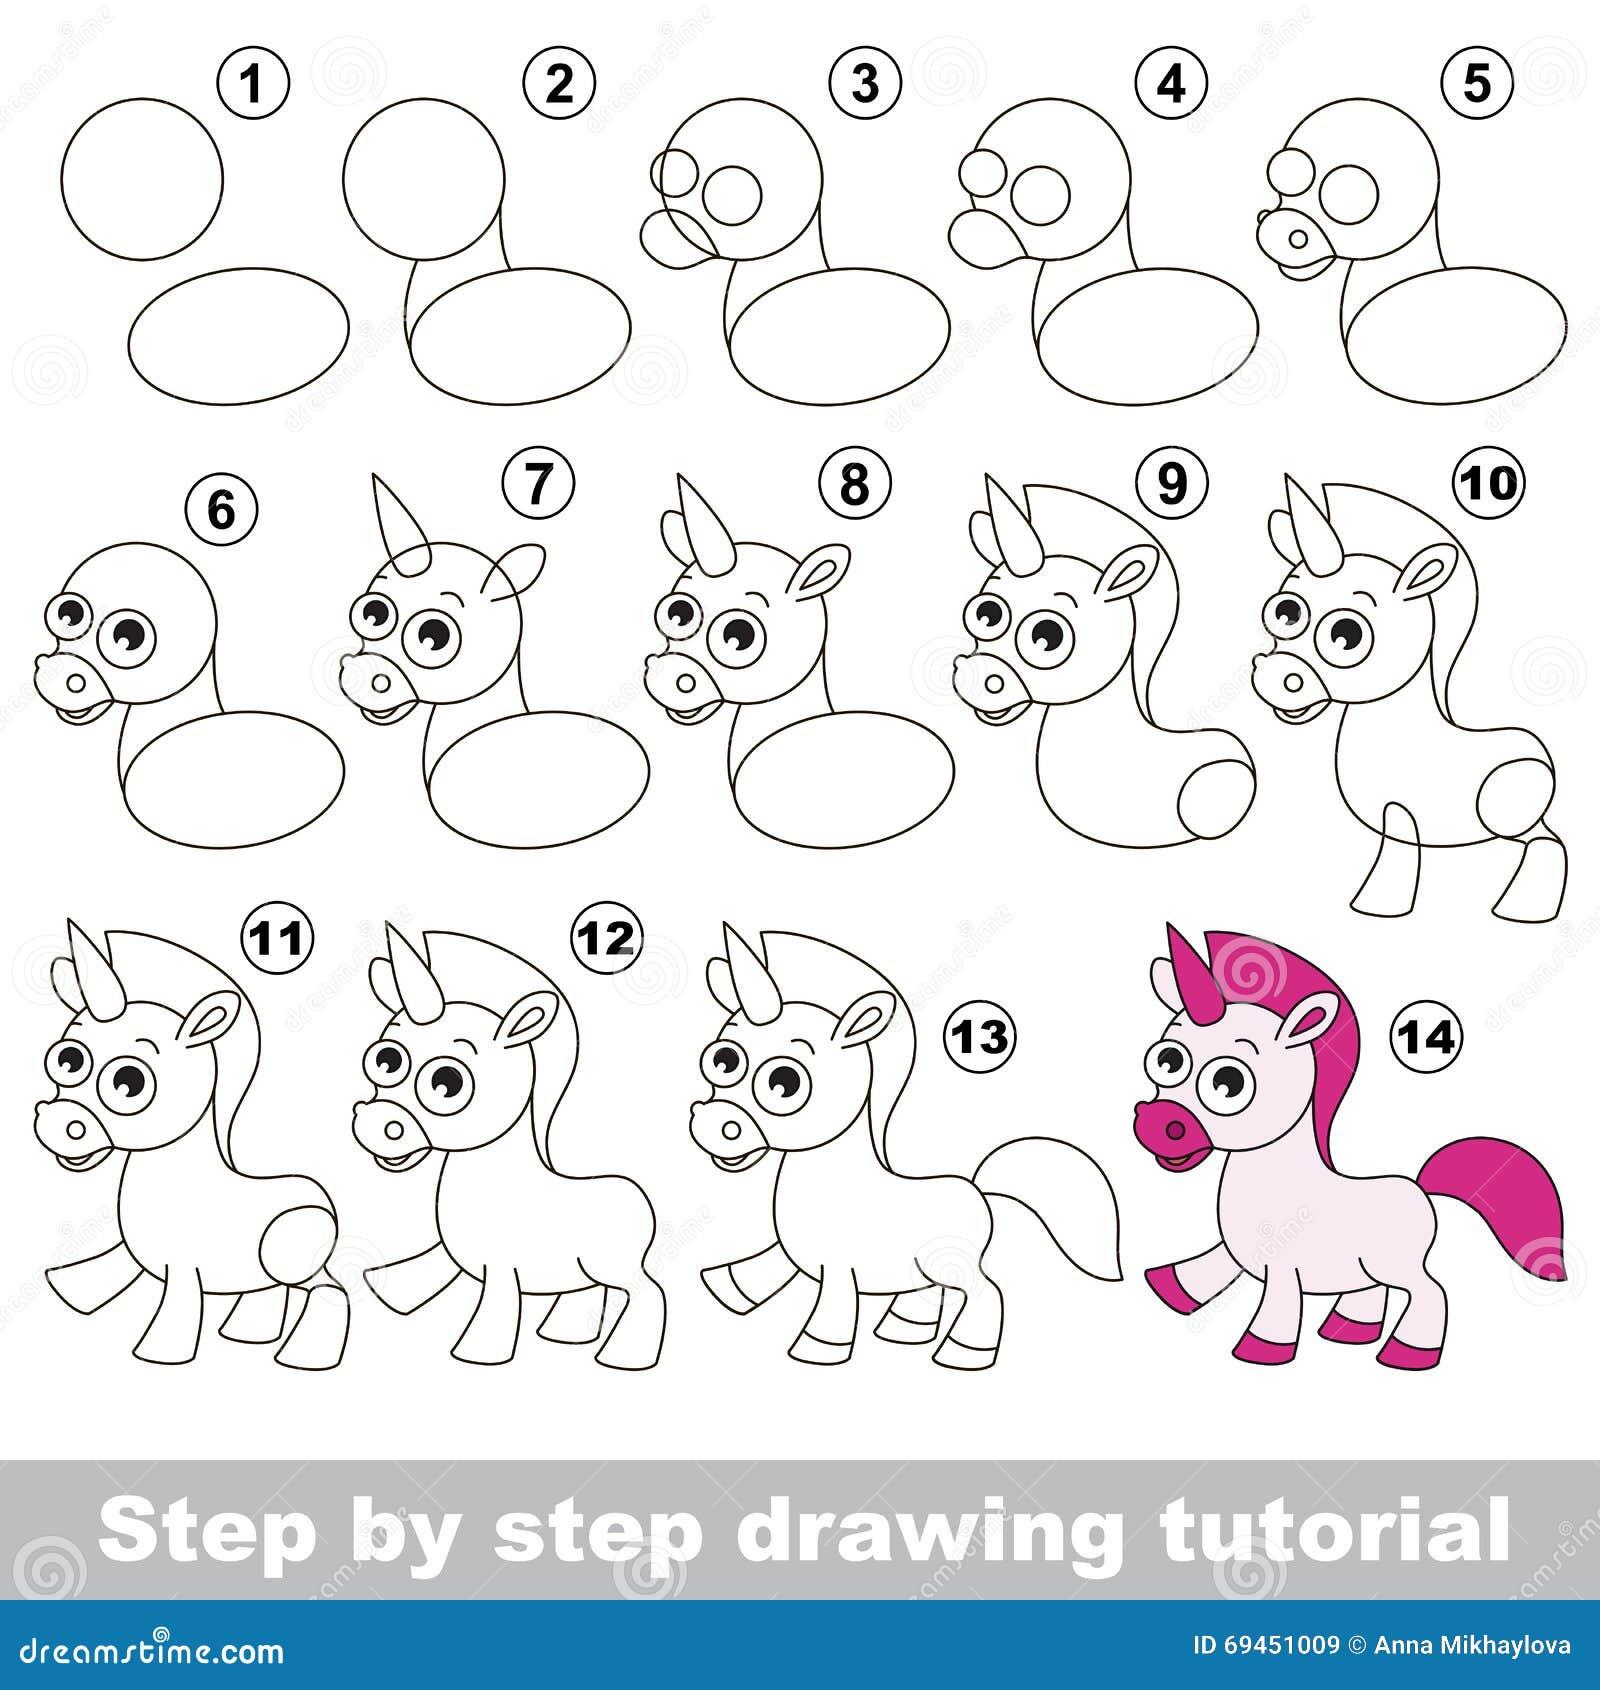 Unicorn Drawing Tutorial Stock Vector Illustration Of Unicorn